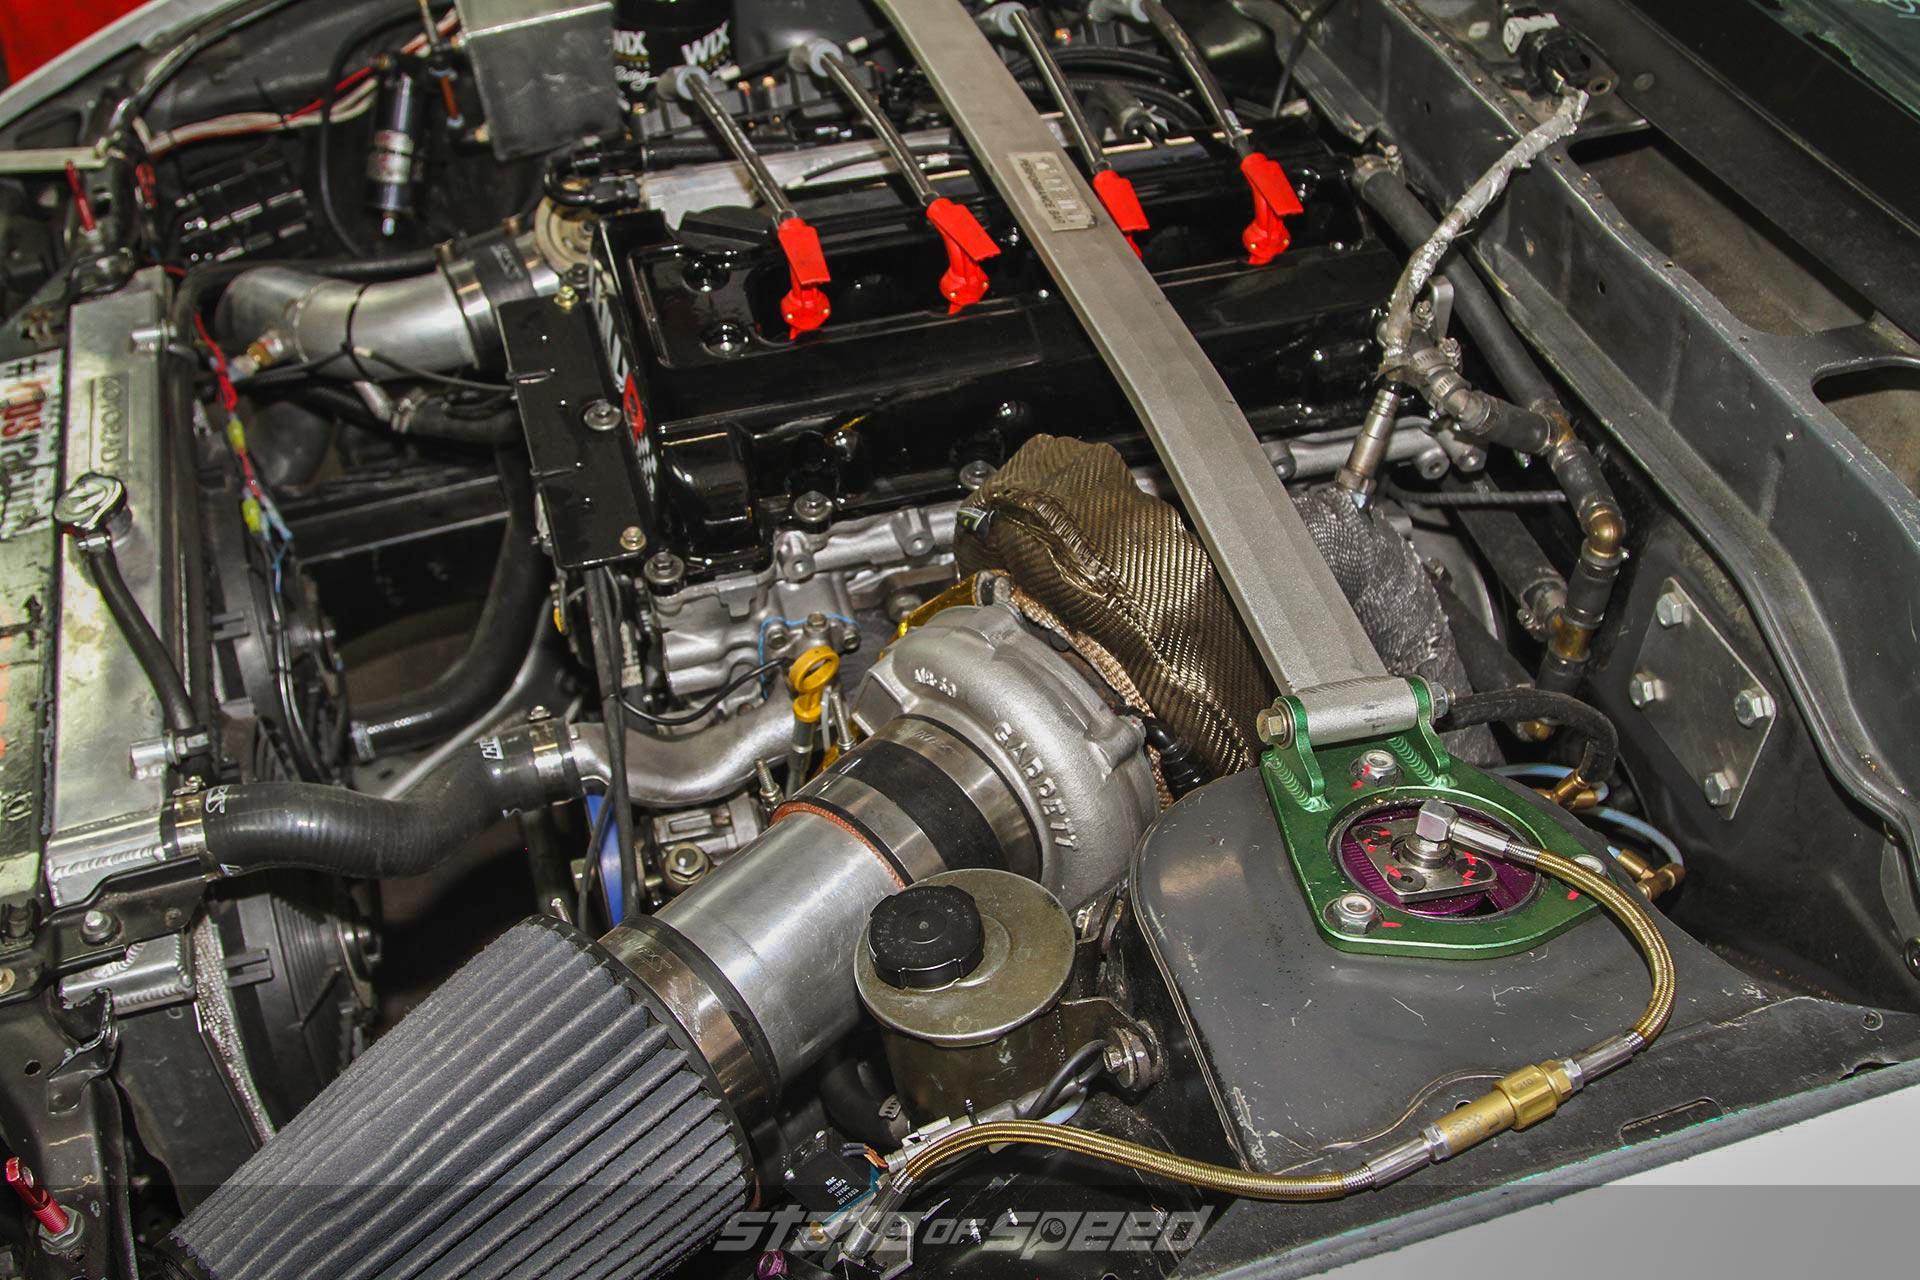 Intake and wastegate in a turbocharged setup